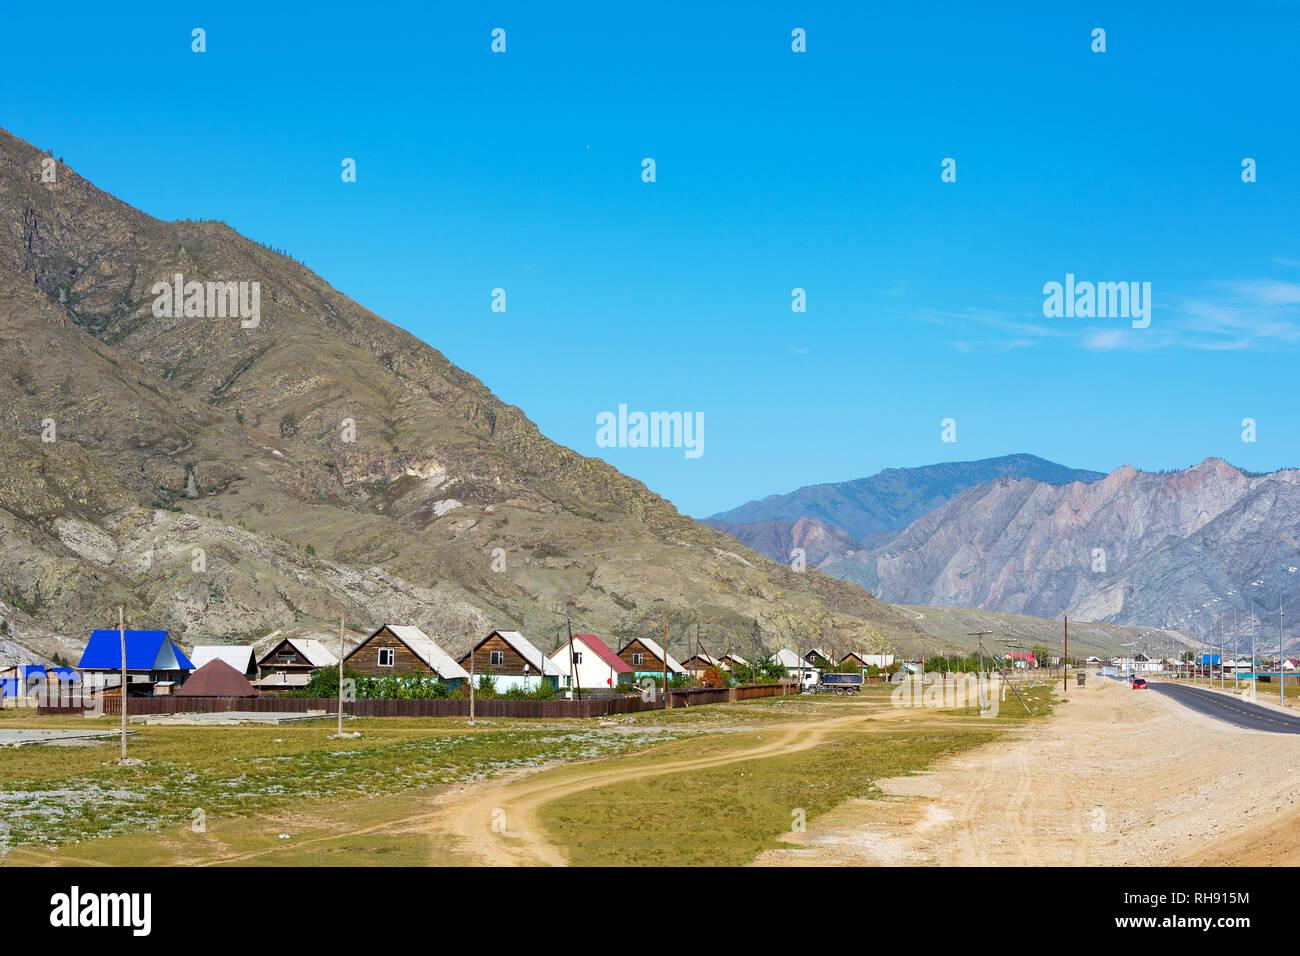 Inya village on the Chuyskiy tract, Altai Republic - Stock Image